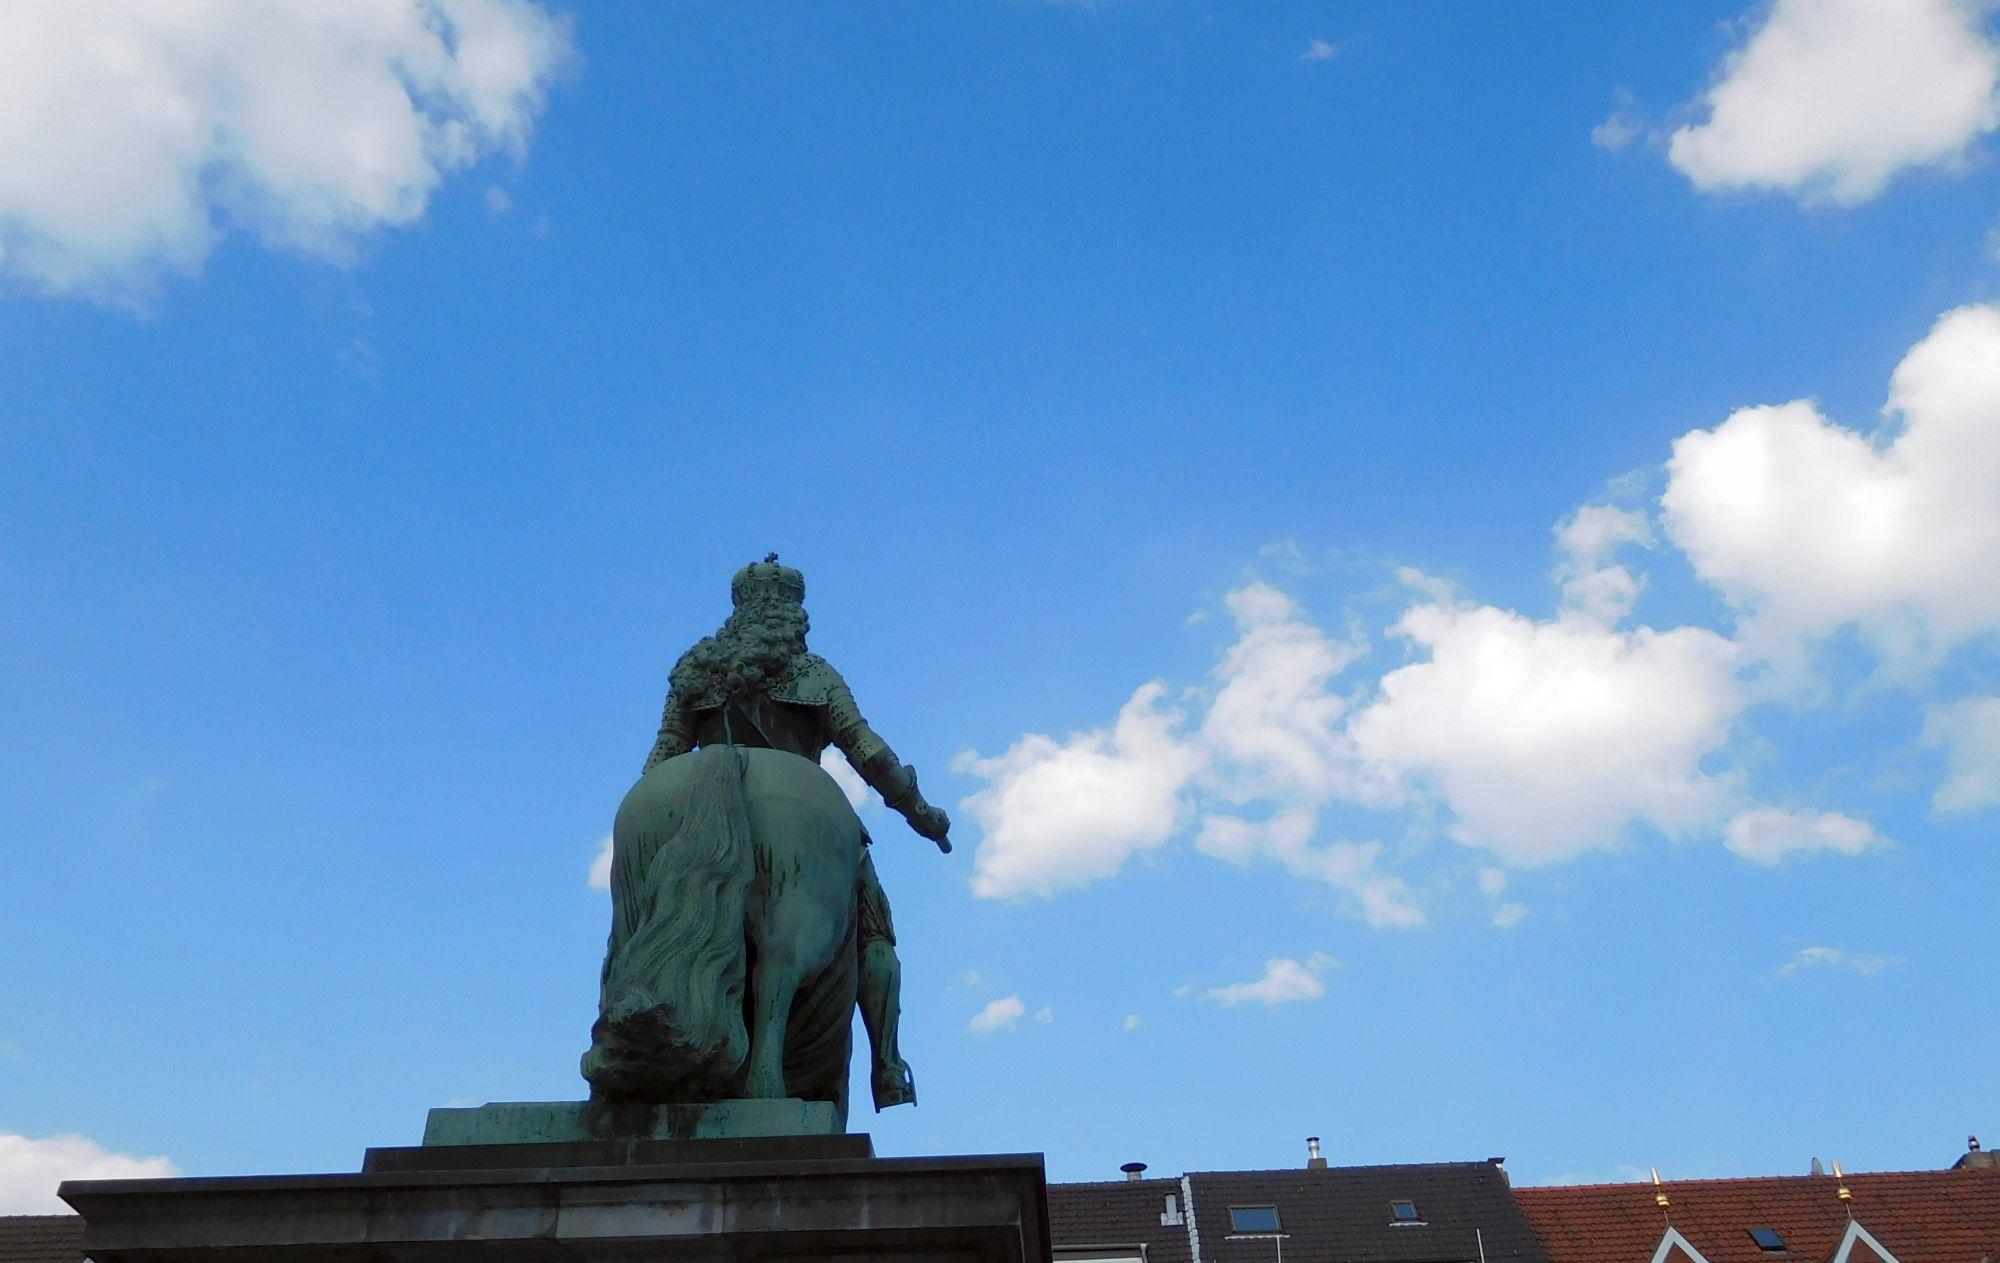 Kurfürst Johann Wilhelm - onse Jan Wellem